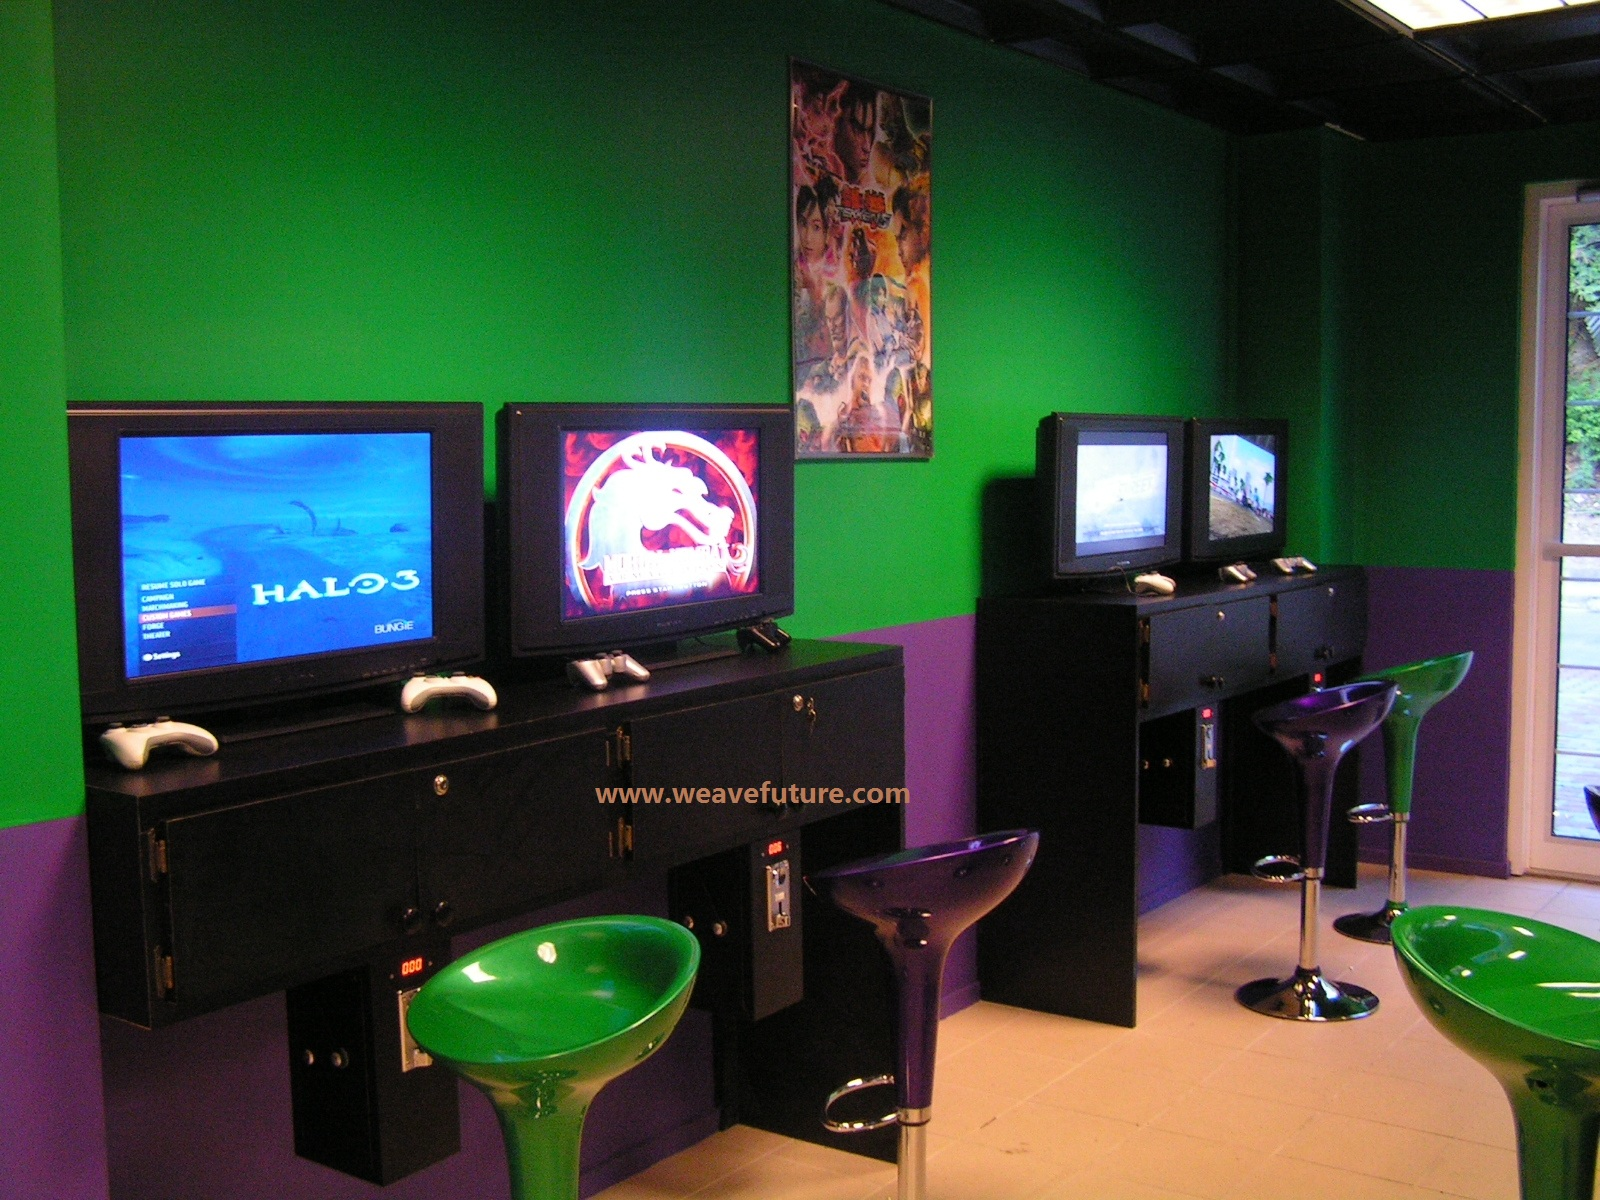 Internet Cafe Software, Cyber Cafe Hardware, Kiosk, Self Service